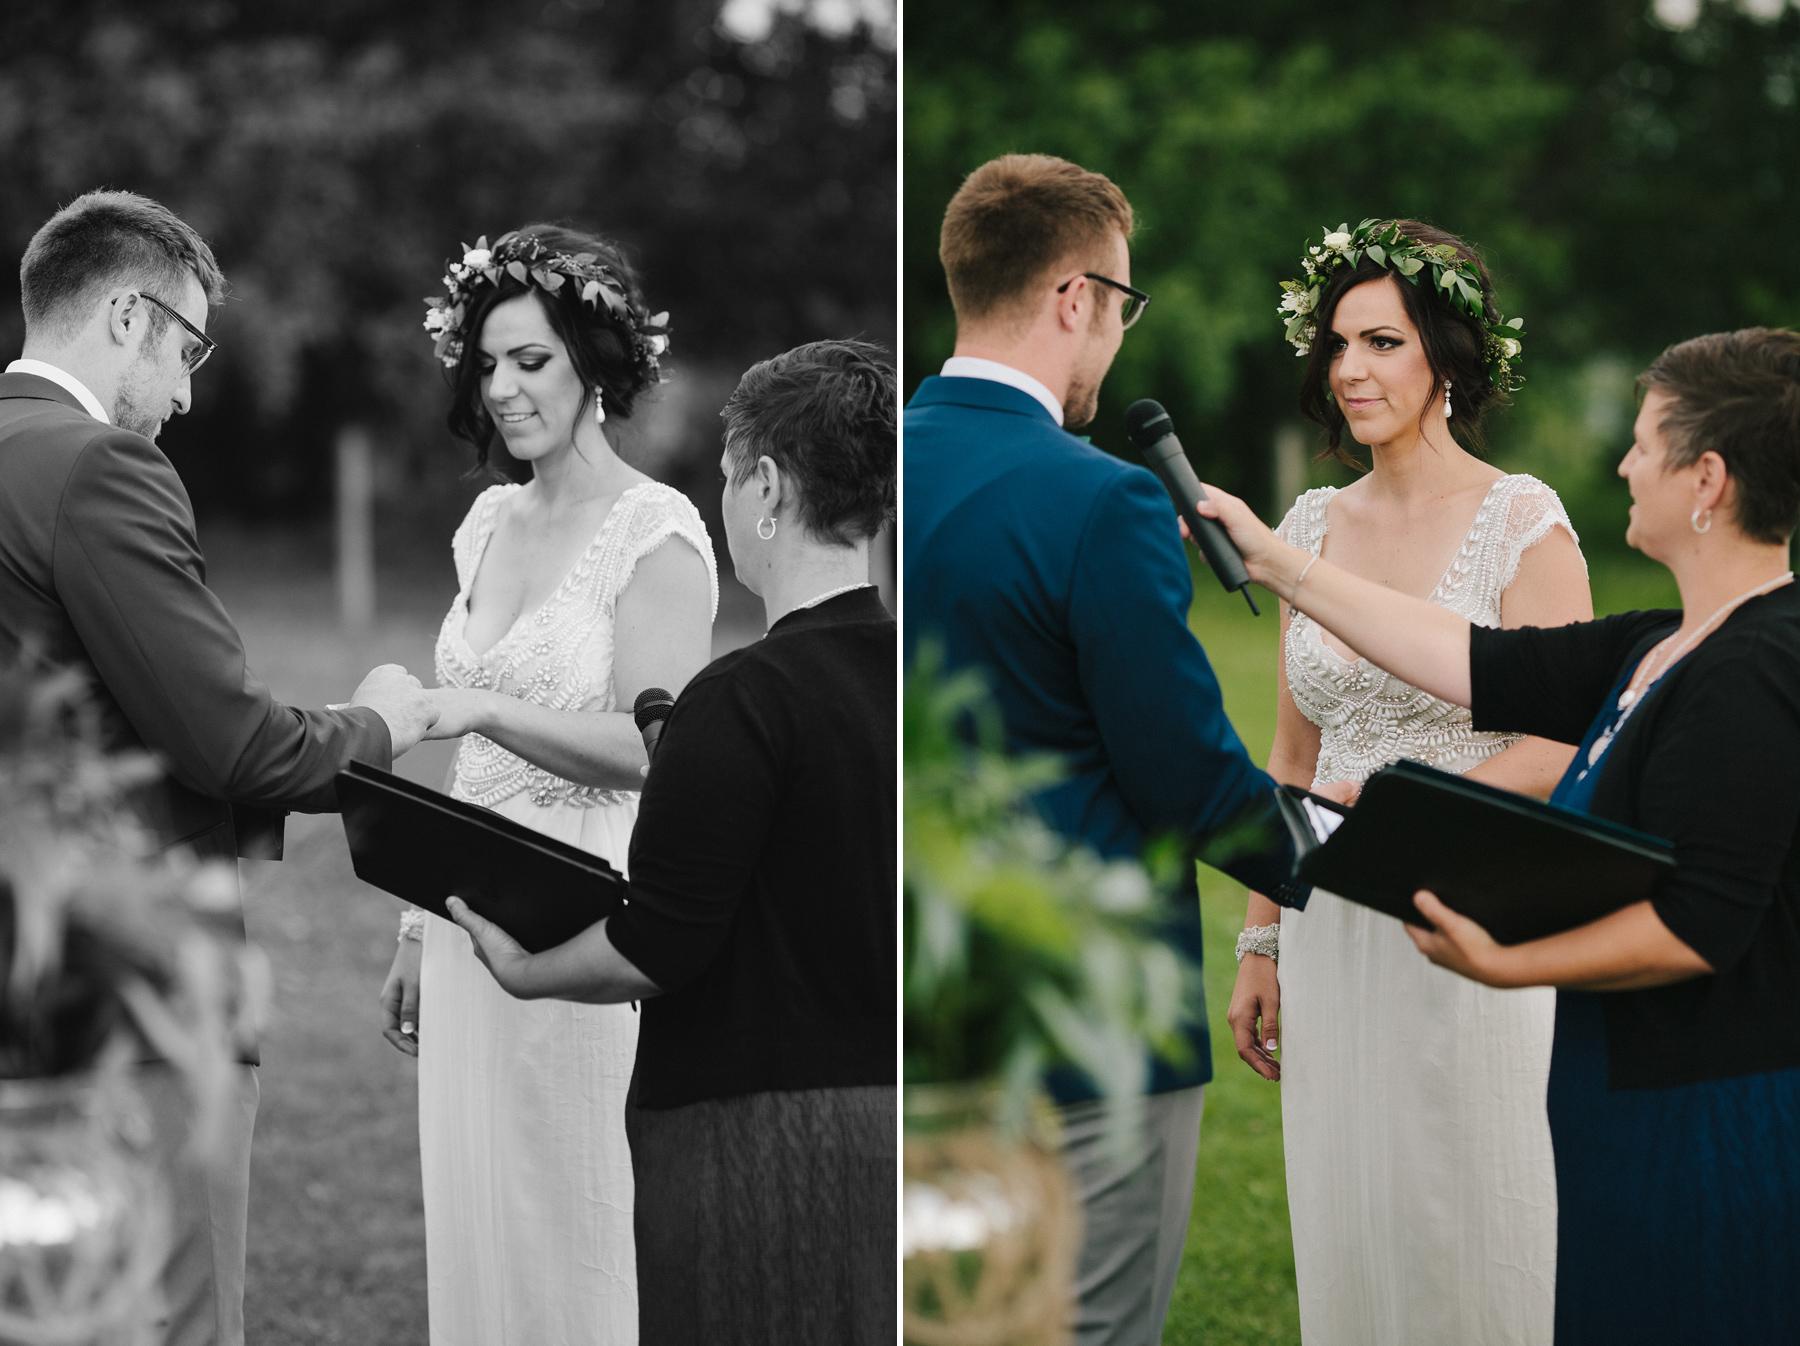 alberta-farm-wedding-photographer-rp-wj-137.jpg